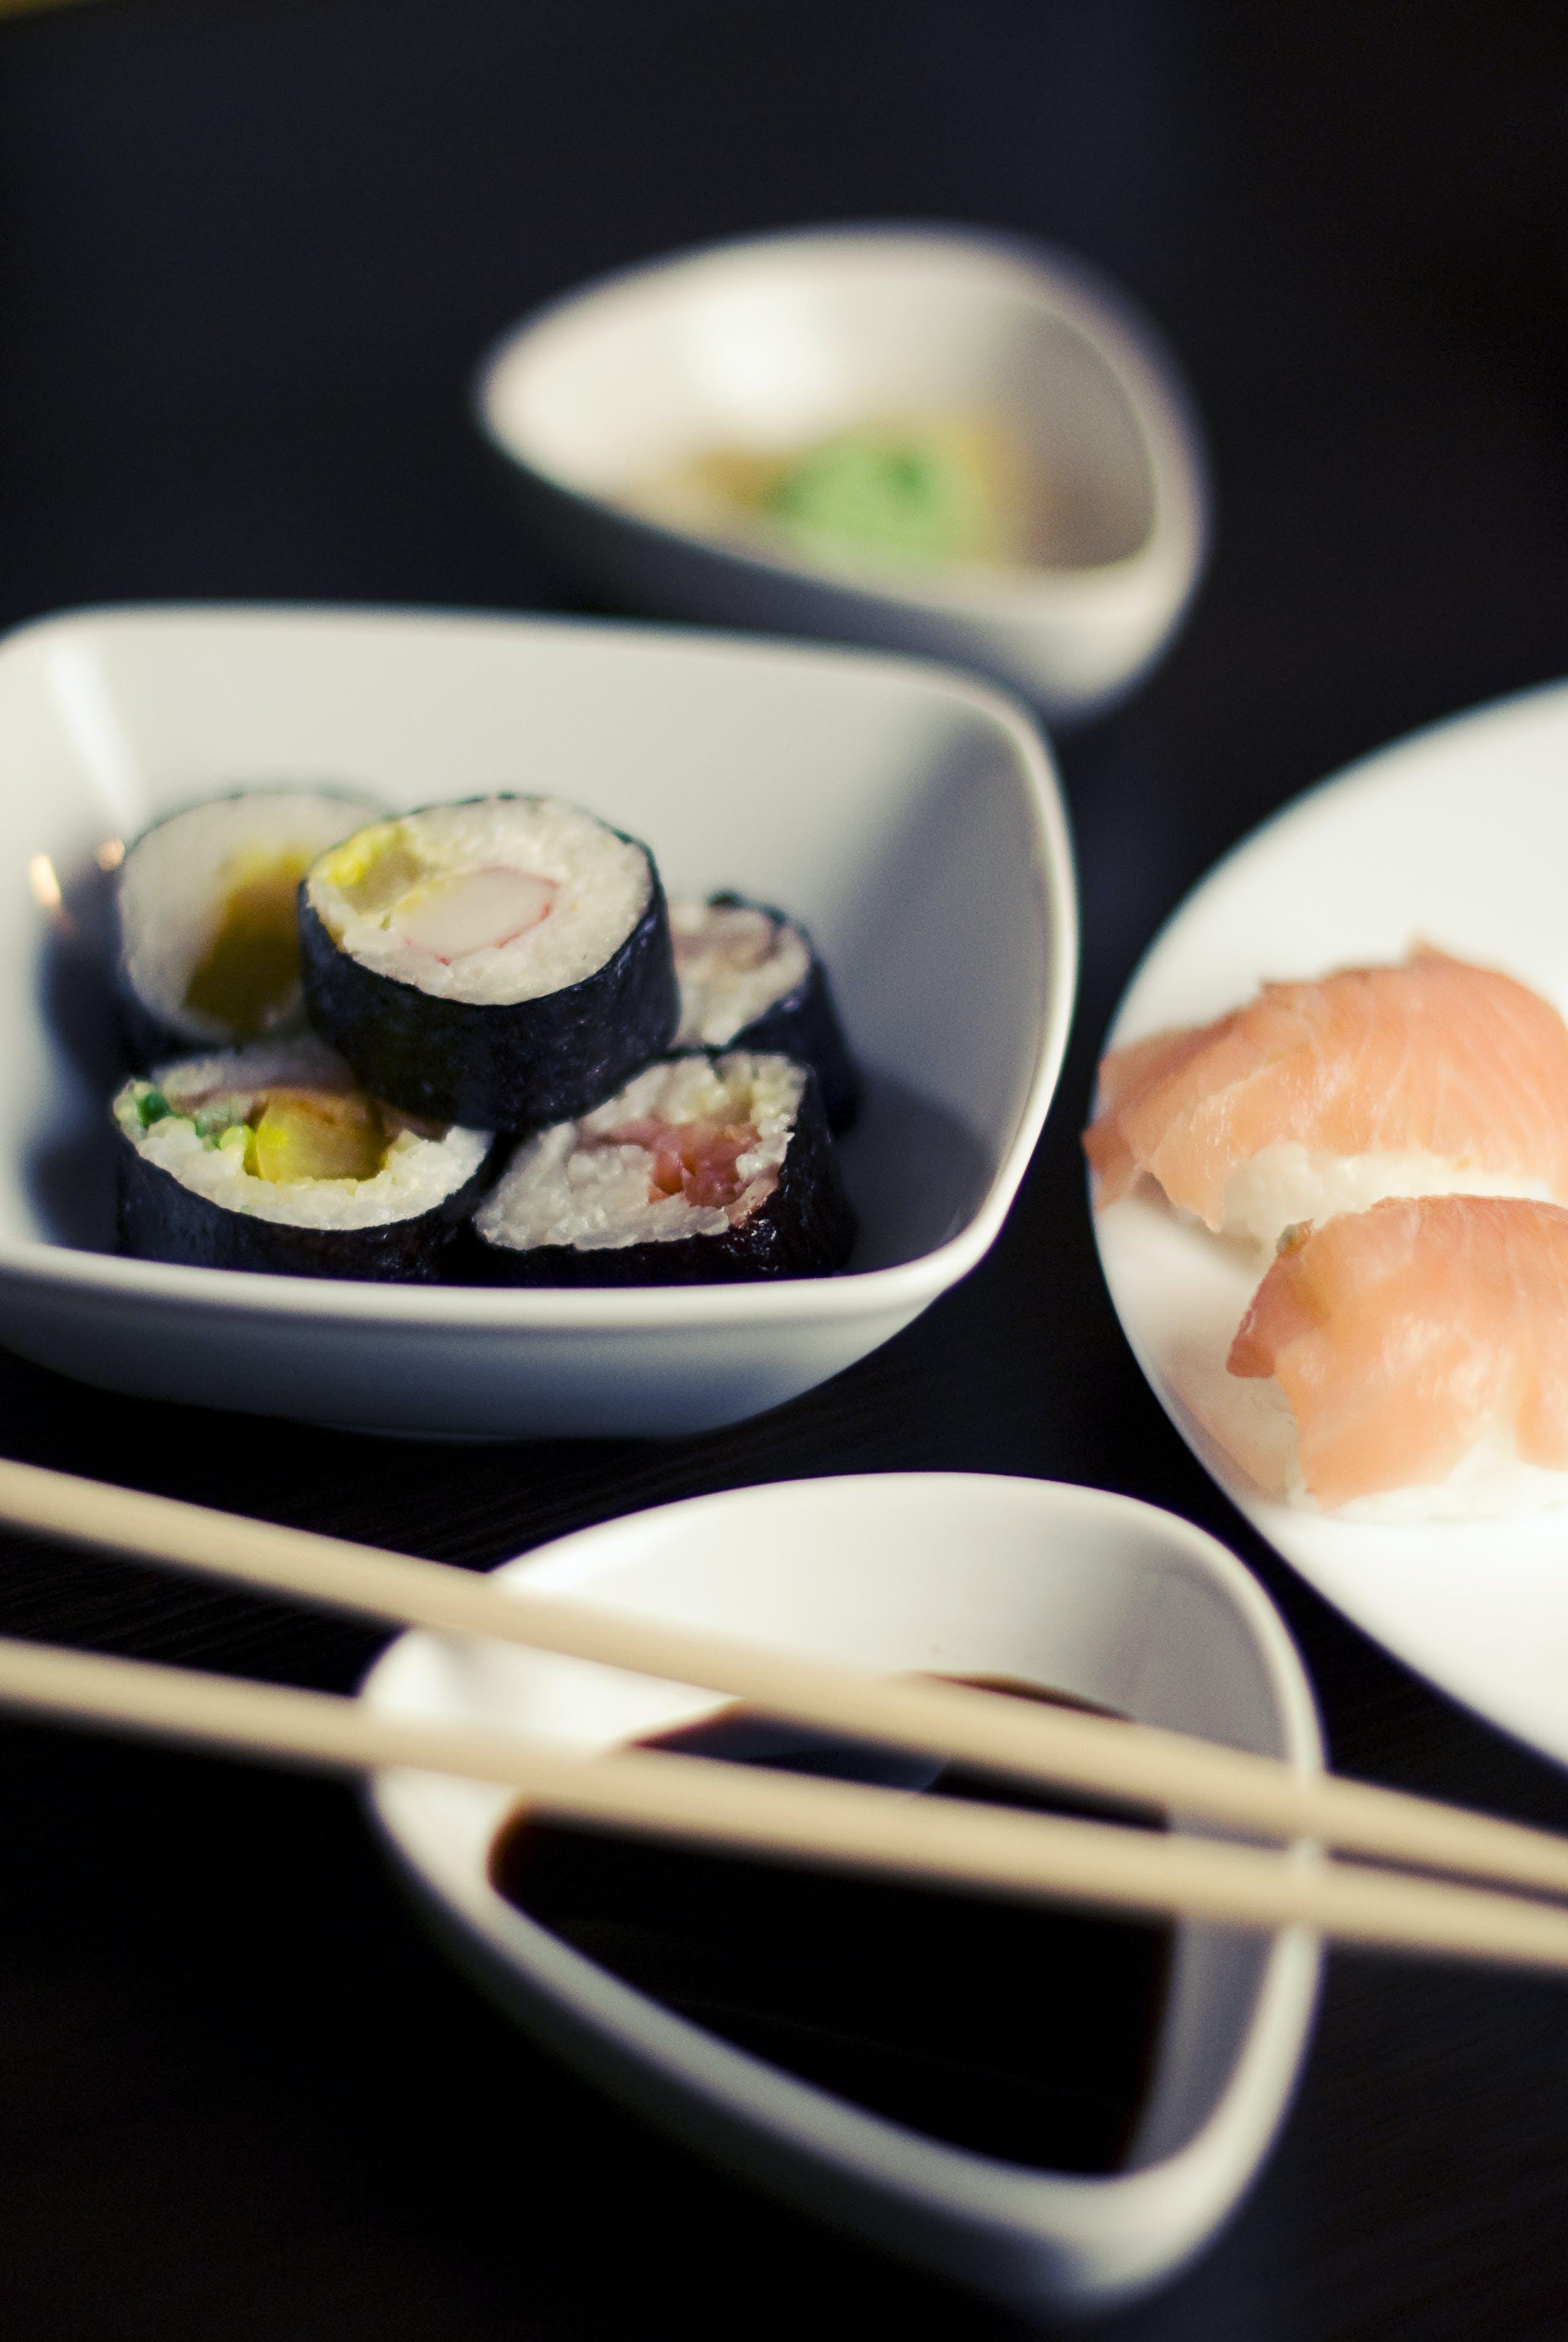 Asian, chopsticks, delicious